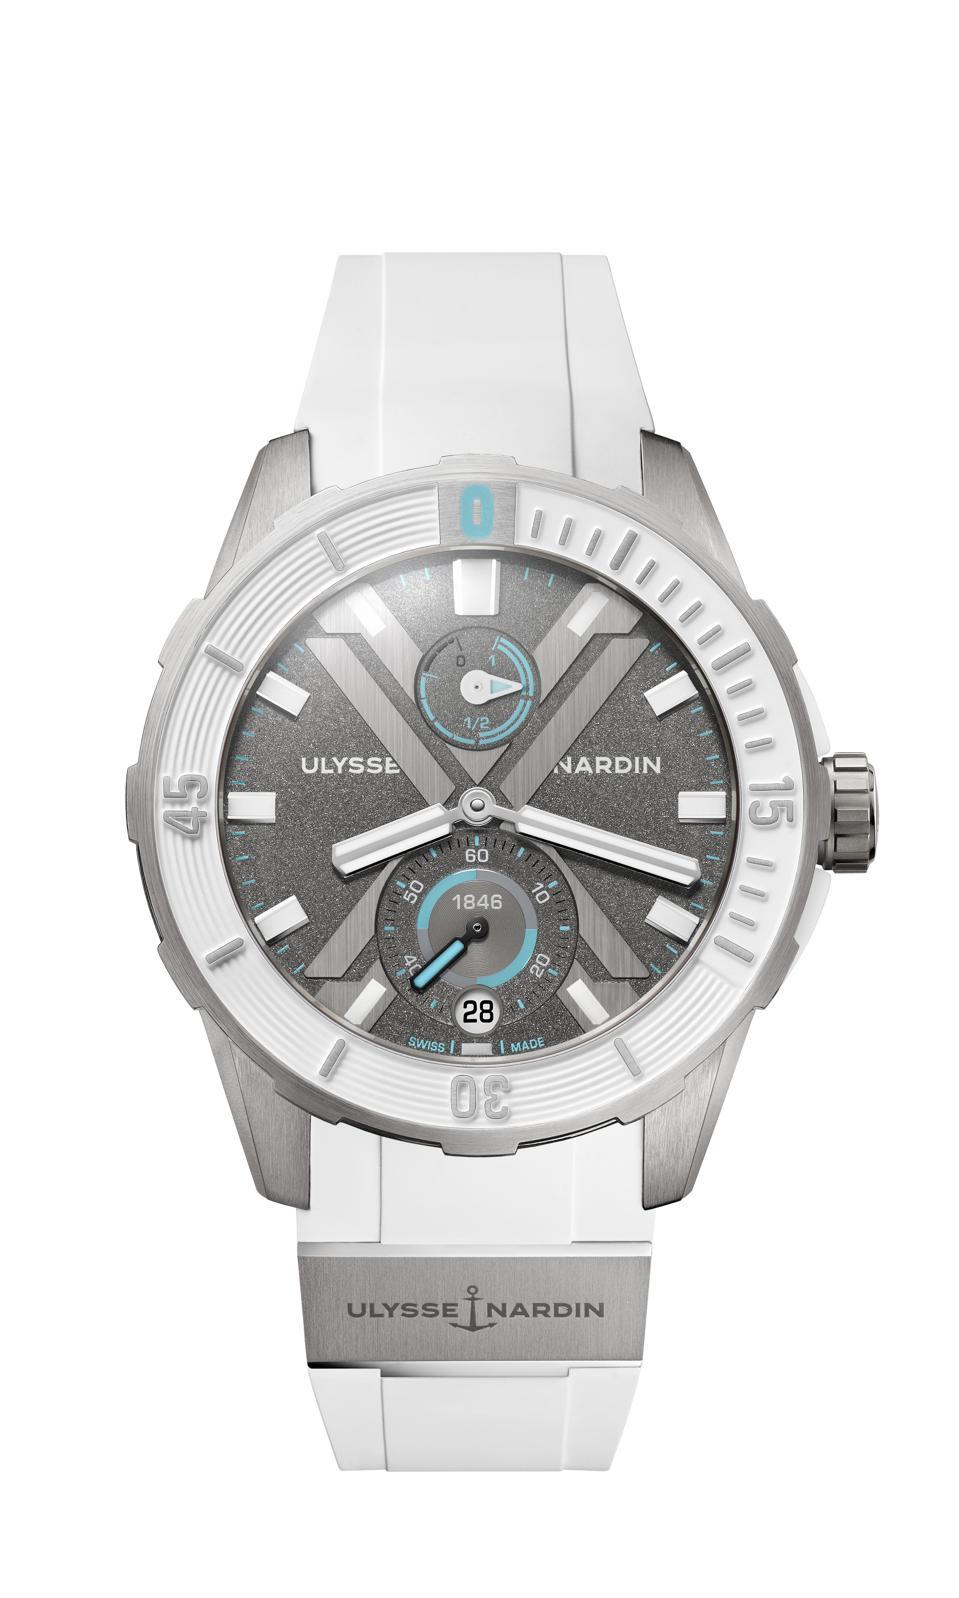 Gleaming white DiverX dive watch from Ulysse Nardon